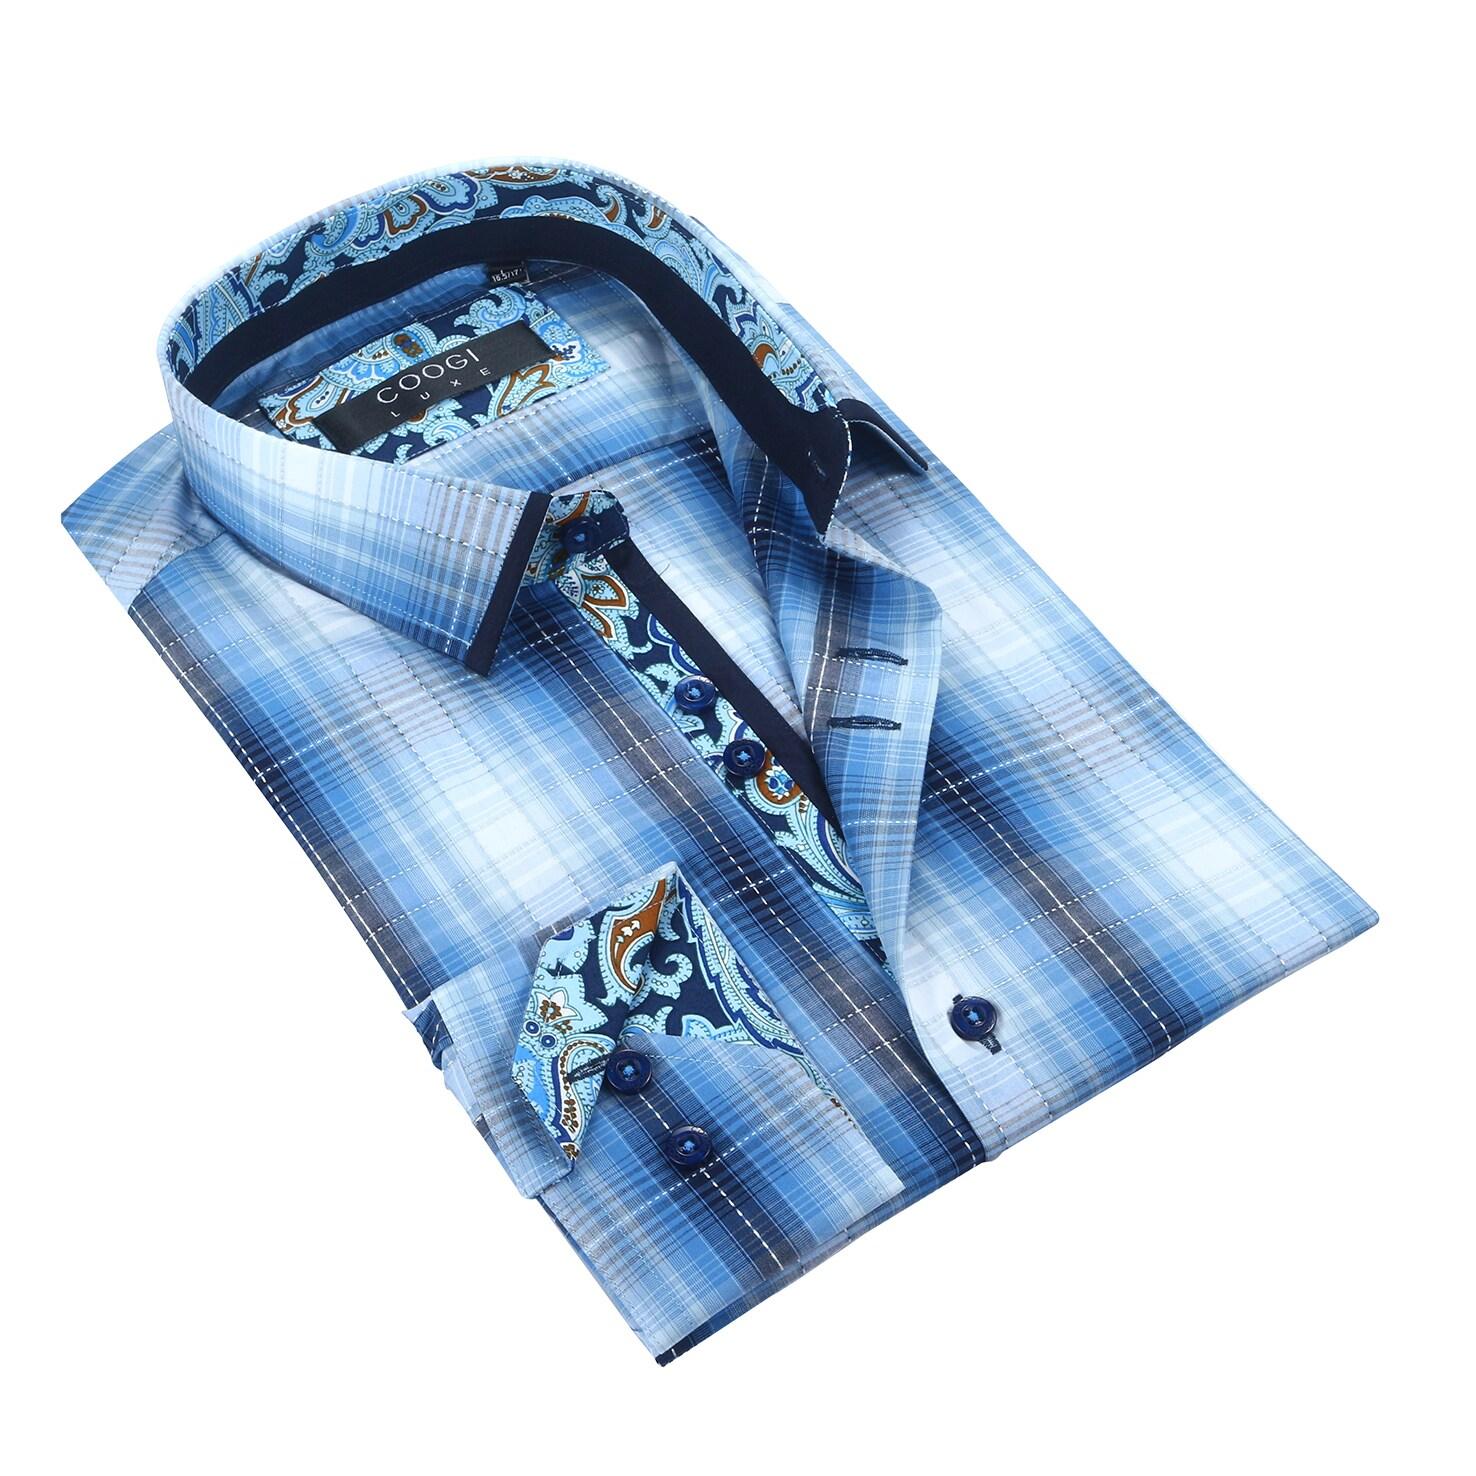 Coogi Mens White/Navy Dress Shirt (3XLarge), Size: 3XL, B...